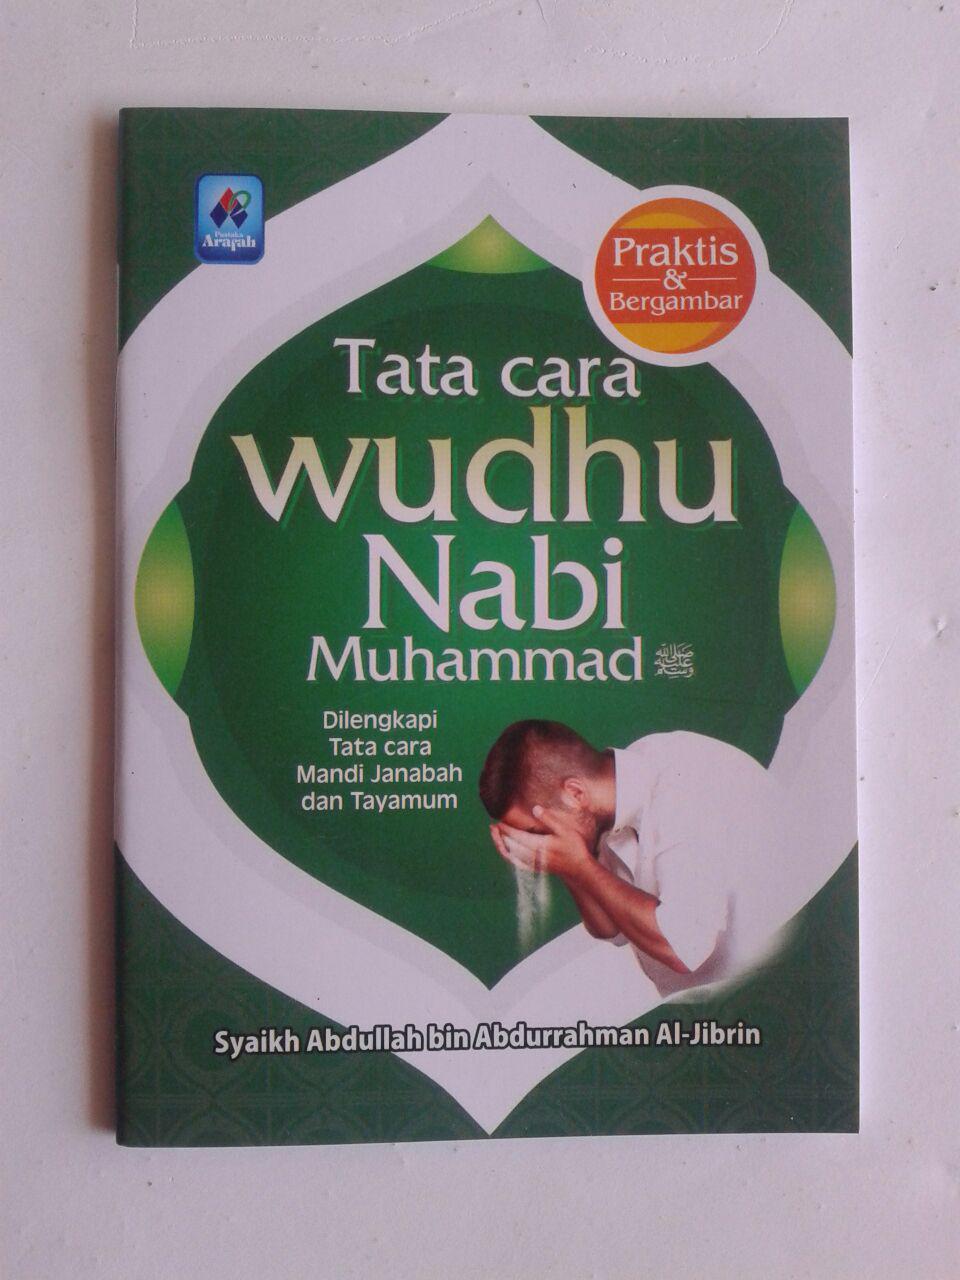 Buku Saku Tata Cara Wudhu Nabi Dilengkapi Mandi Janabah Tayamum cover 2